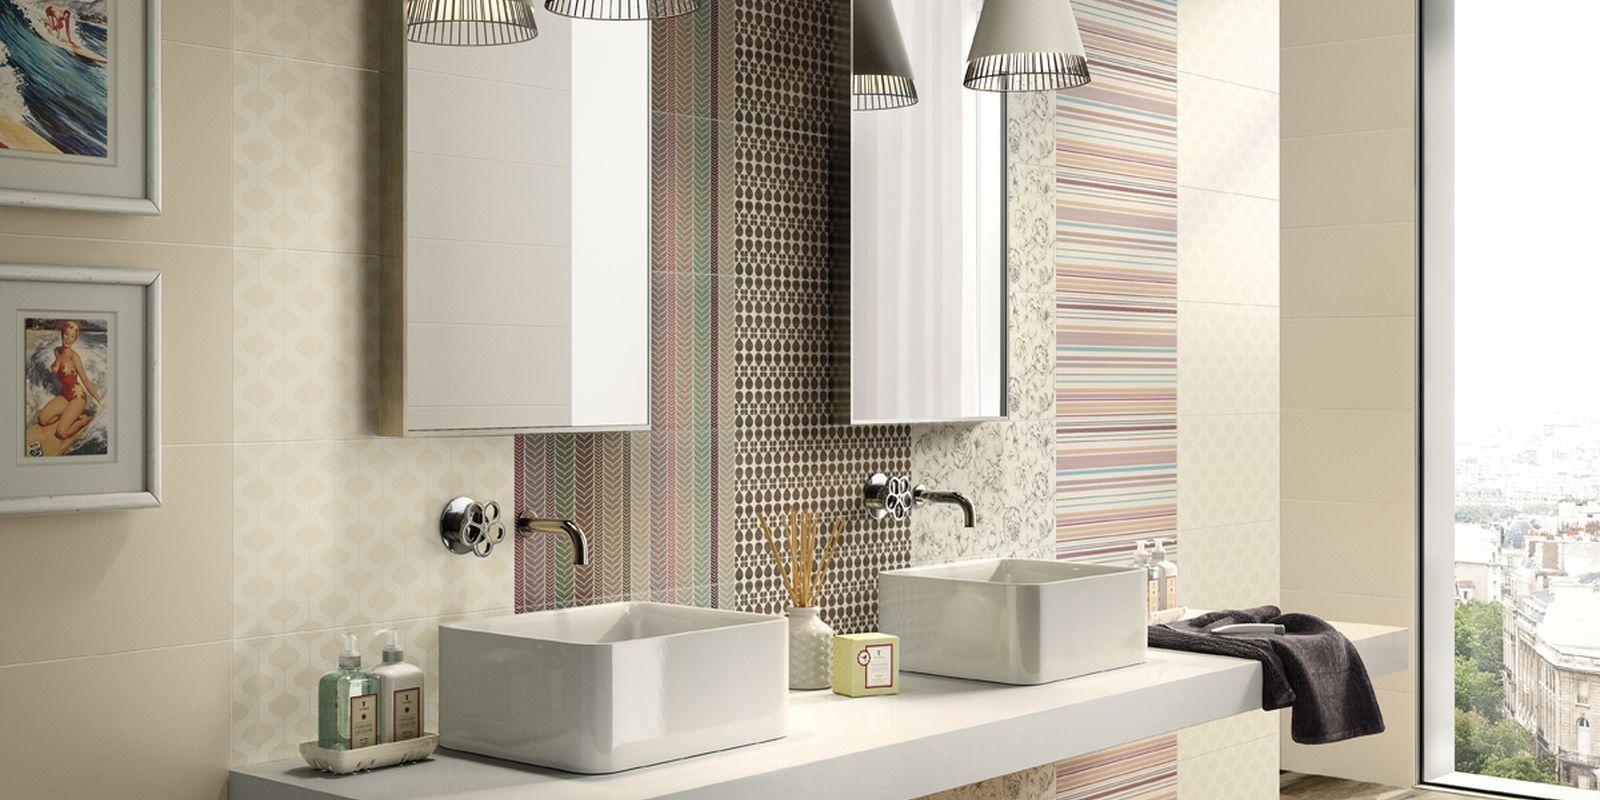 PIASTRELLE MASH-UP, bagno moderno ceramica bicottura da ...